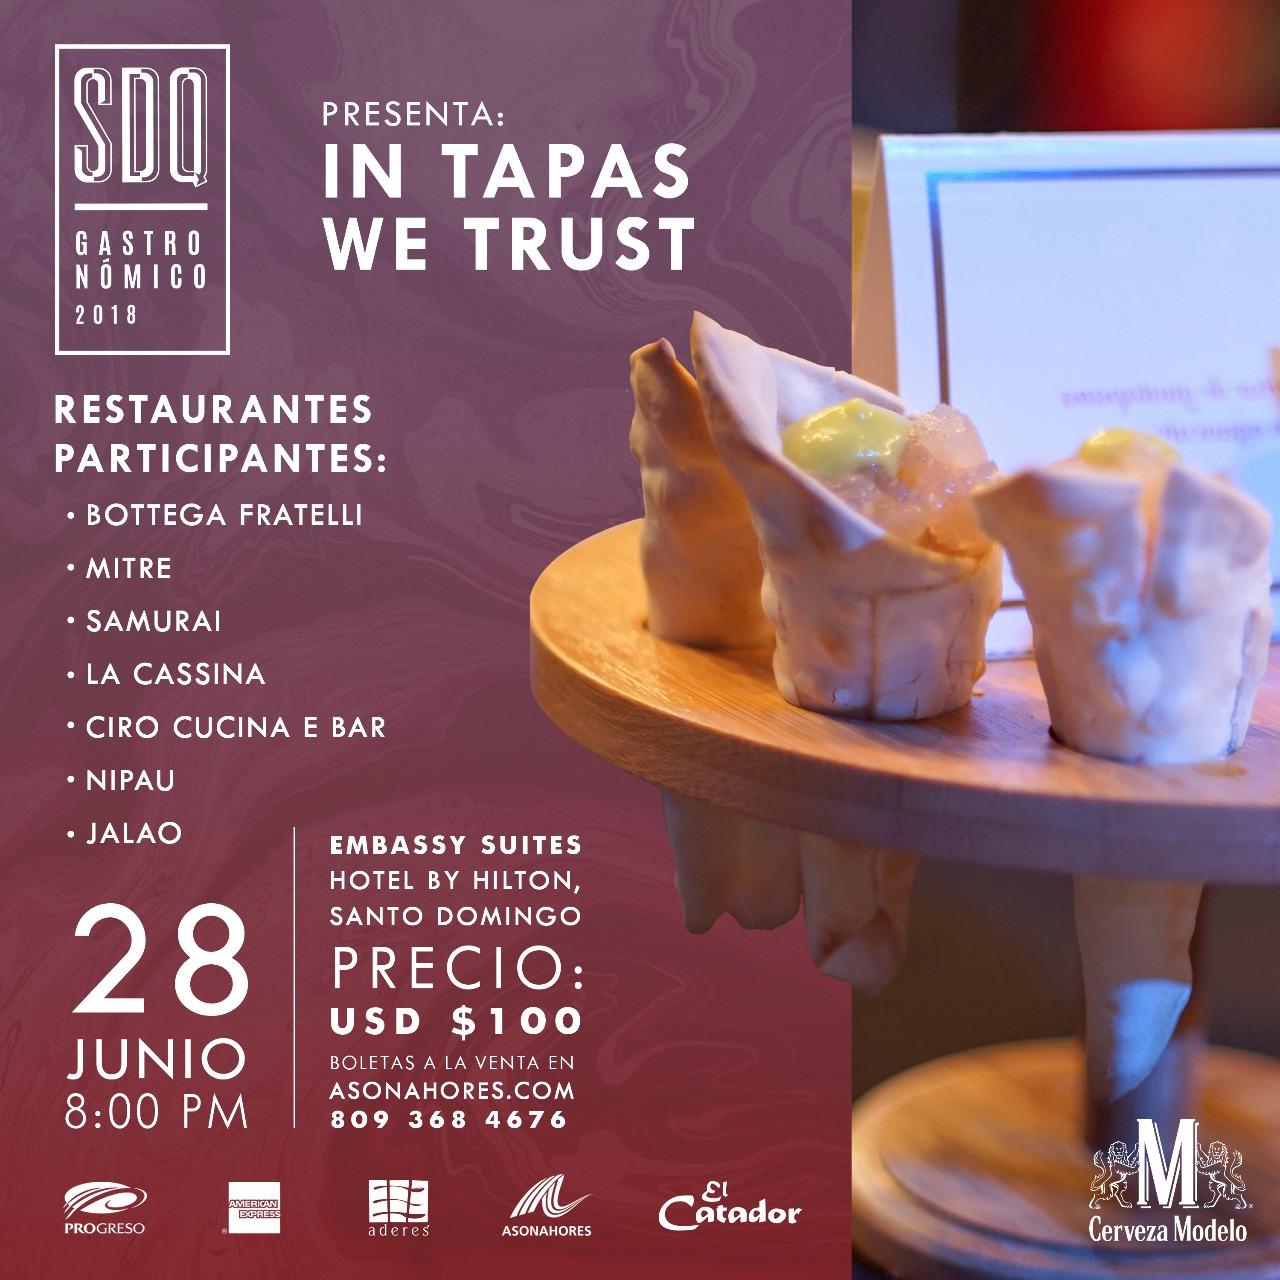 J U N I O 28 - SDQ Restaurant Week - Santo Domingo